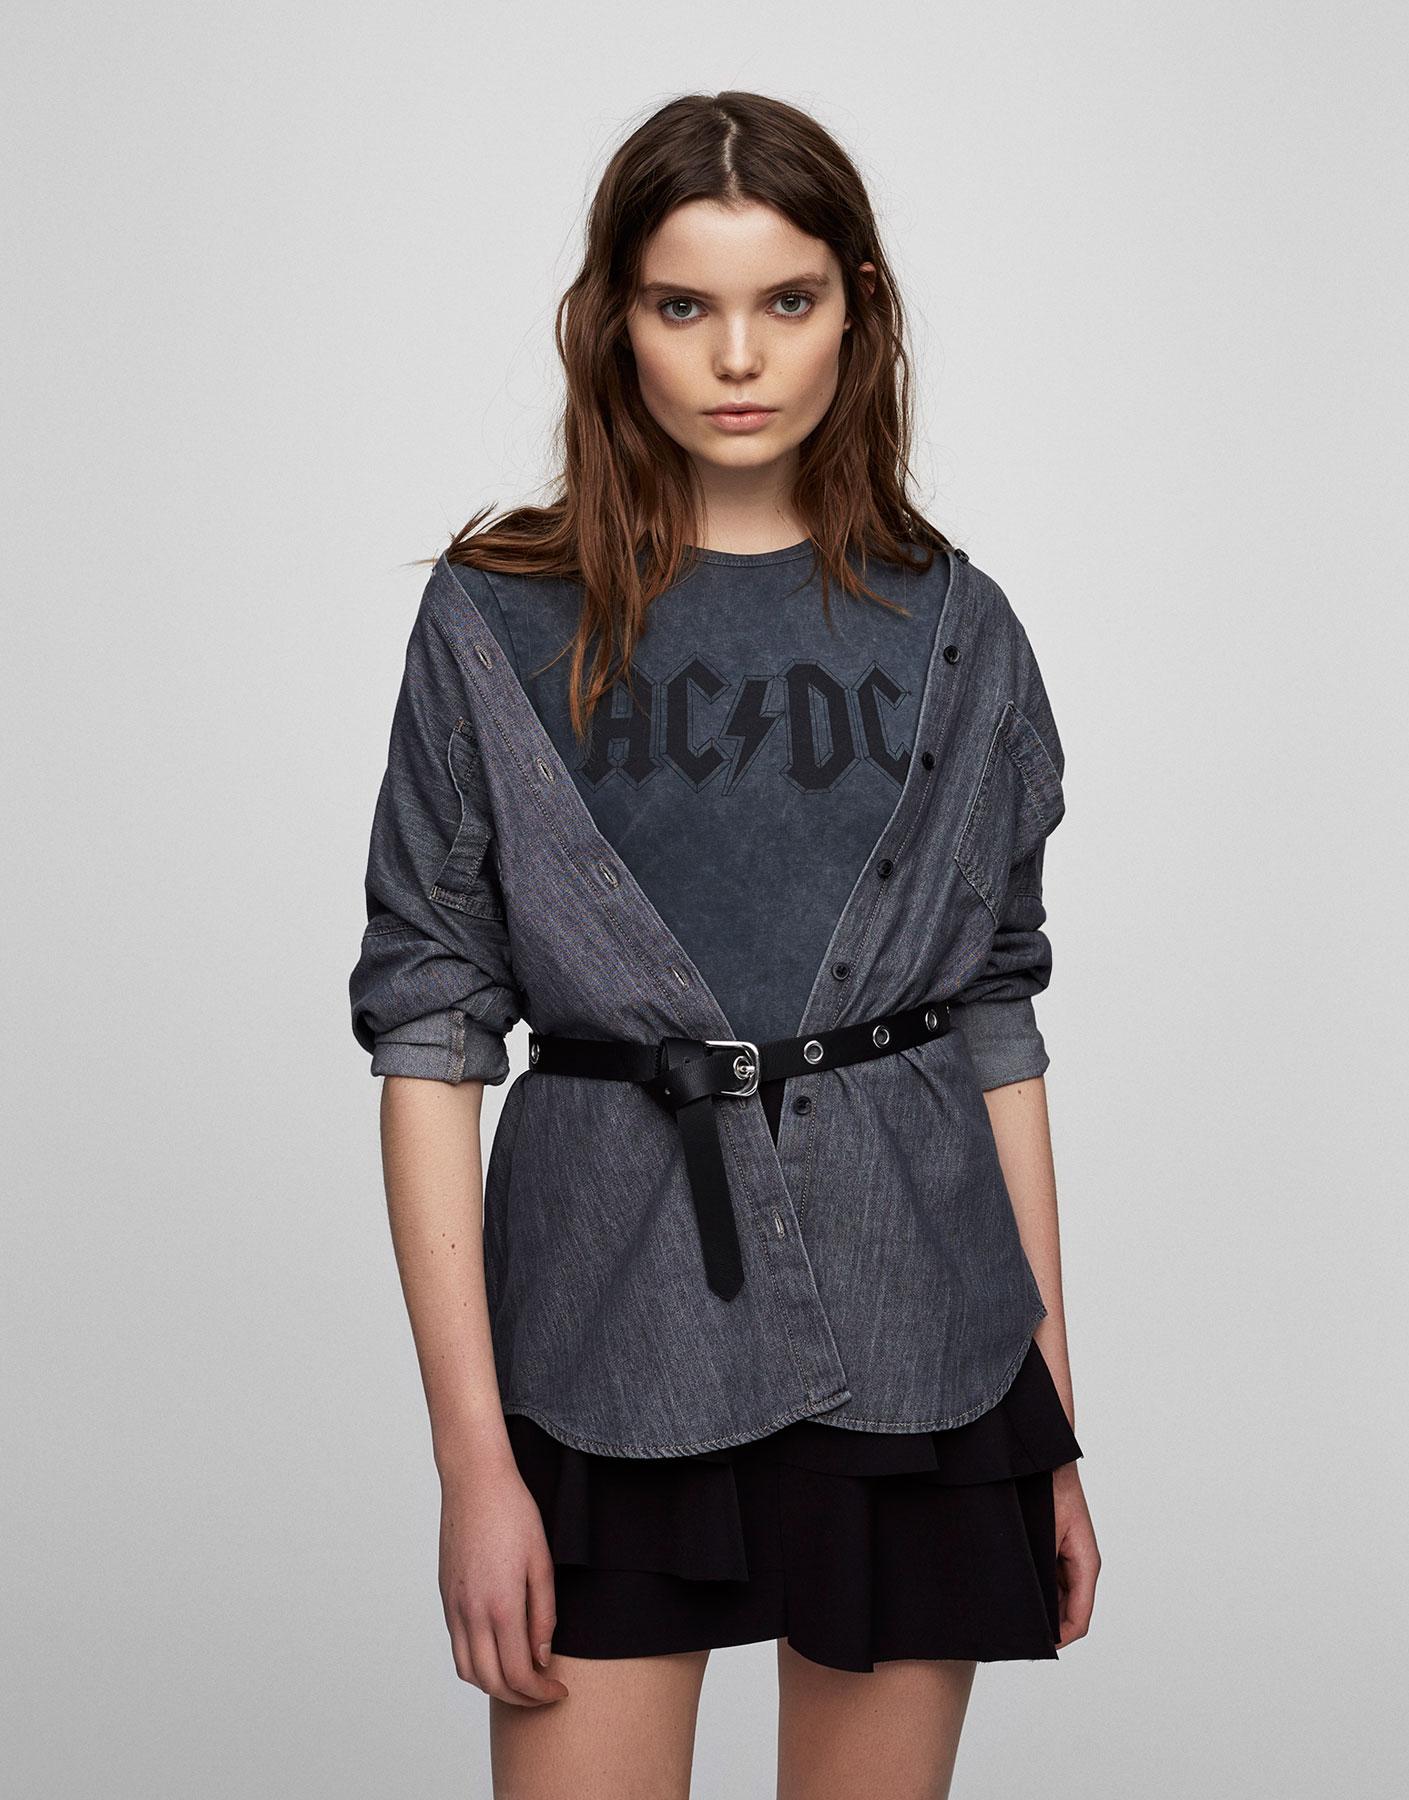 AC/DC bodysuit